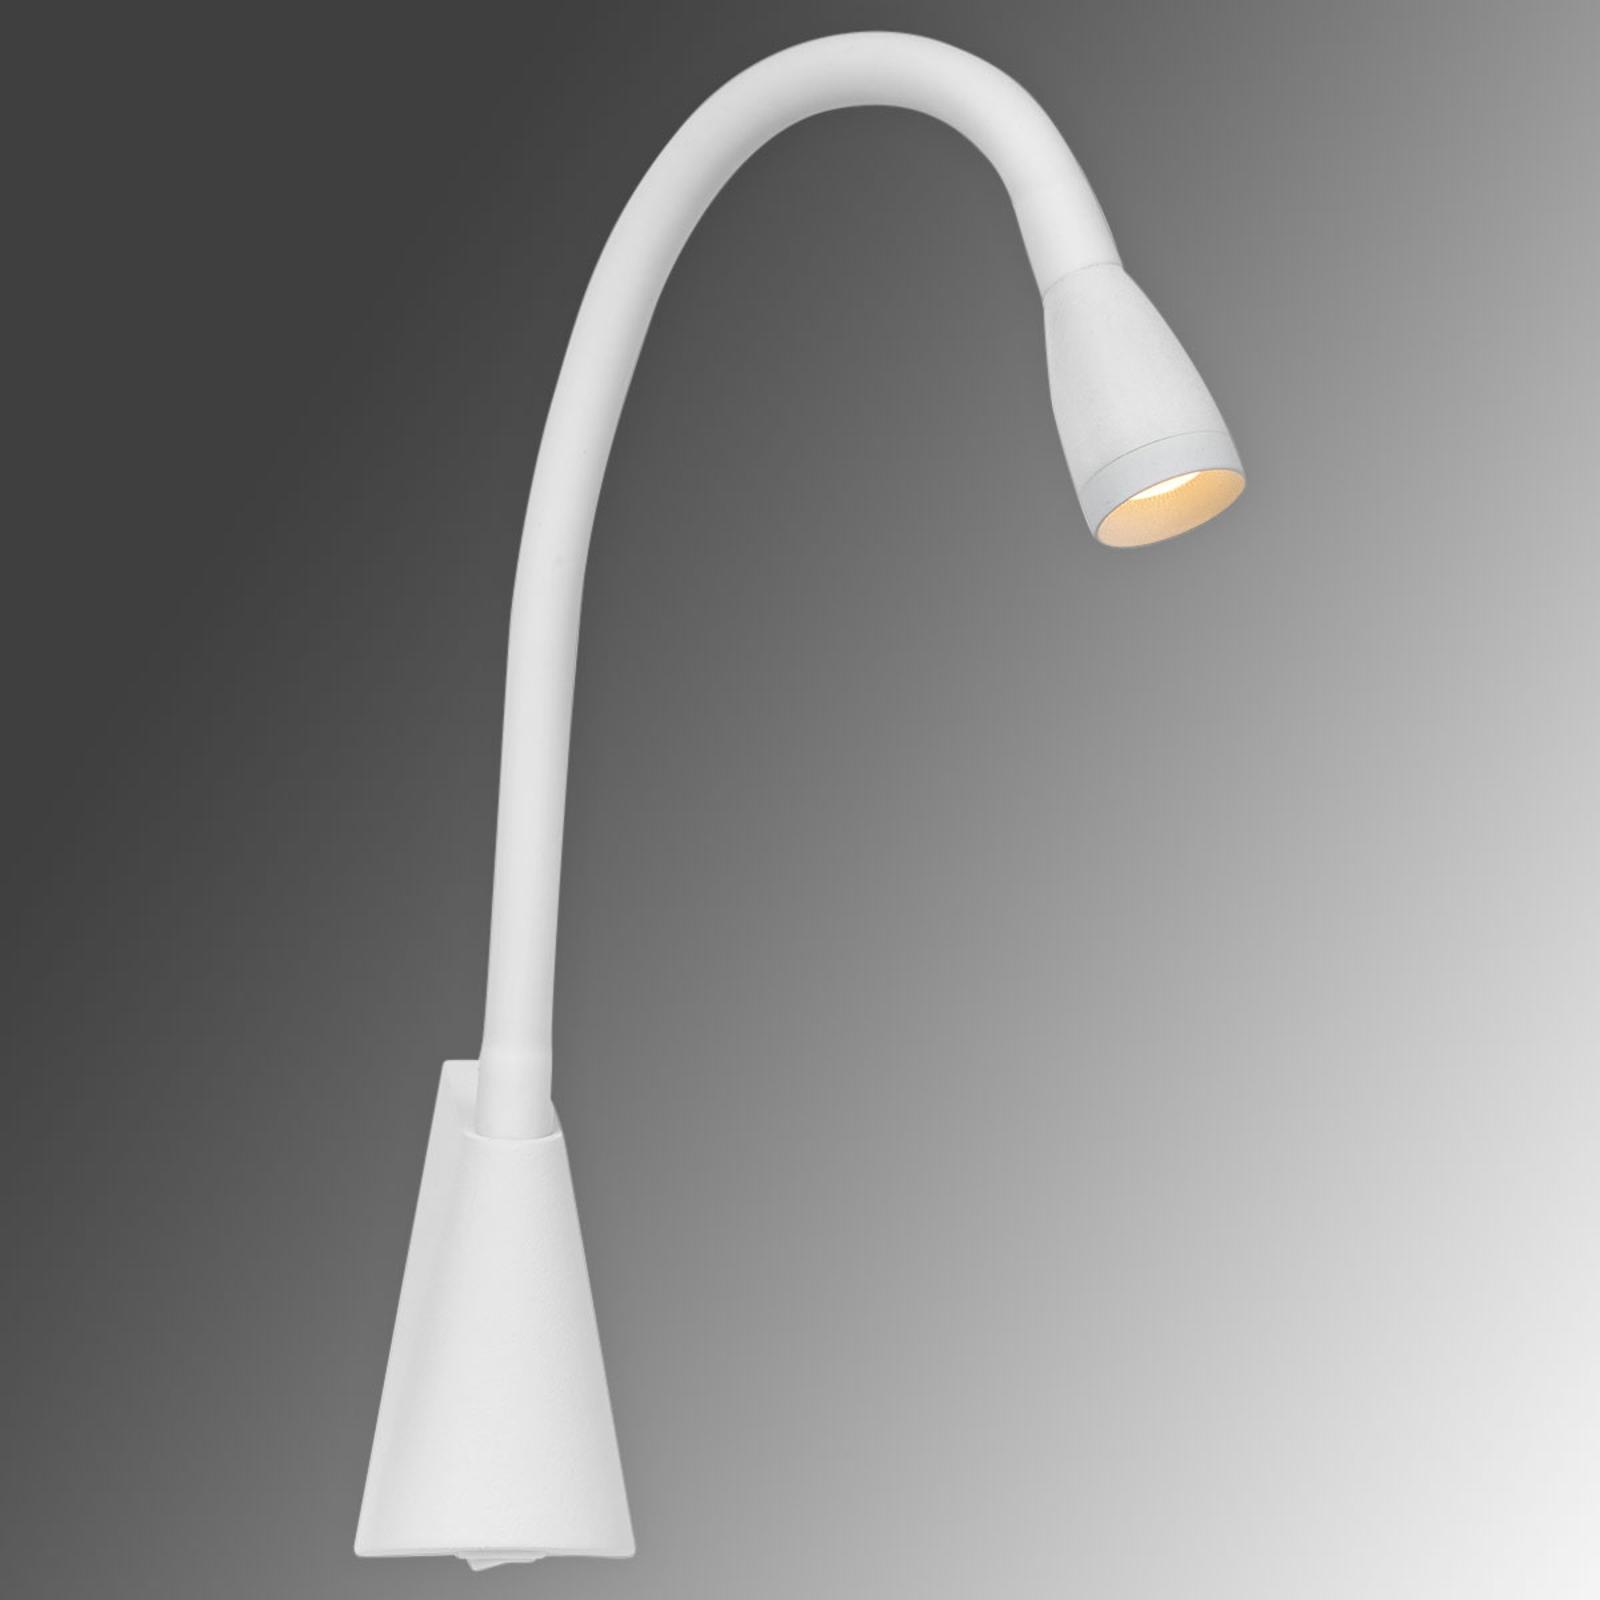 Buigbare LED wandlamp Galen in wit